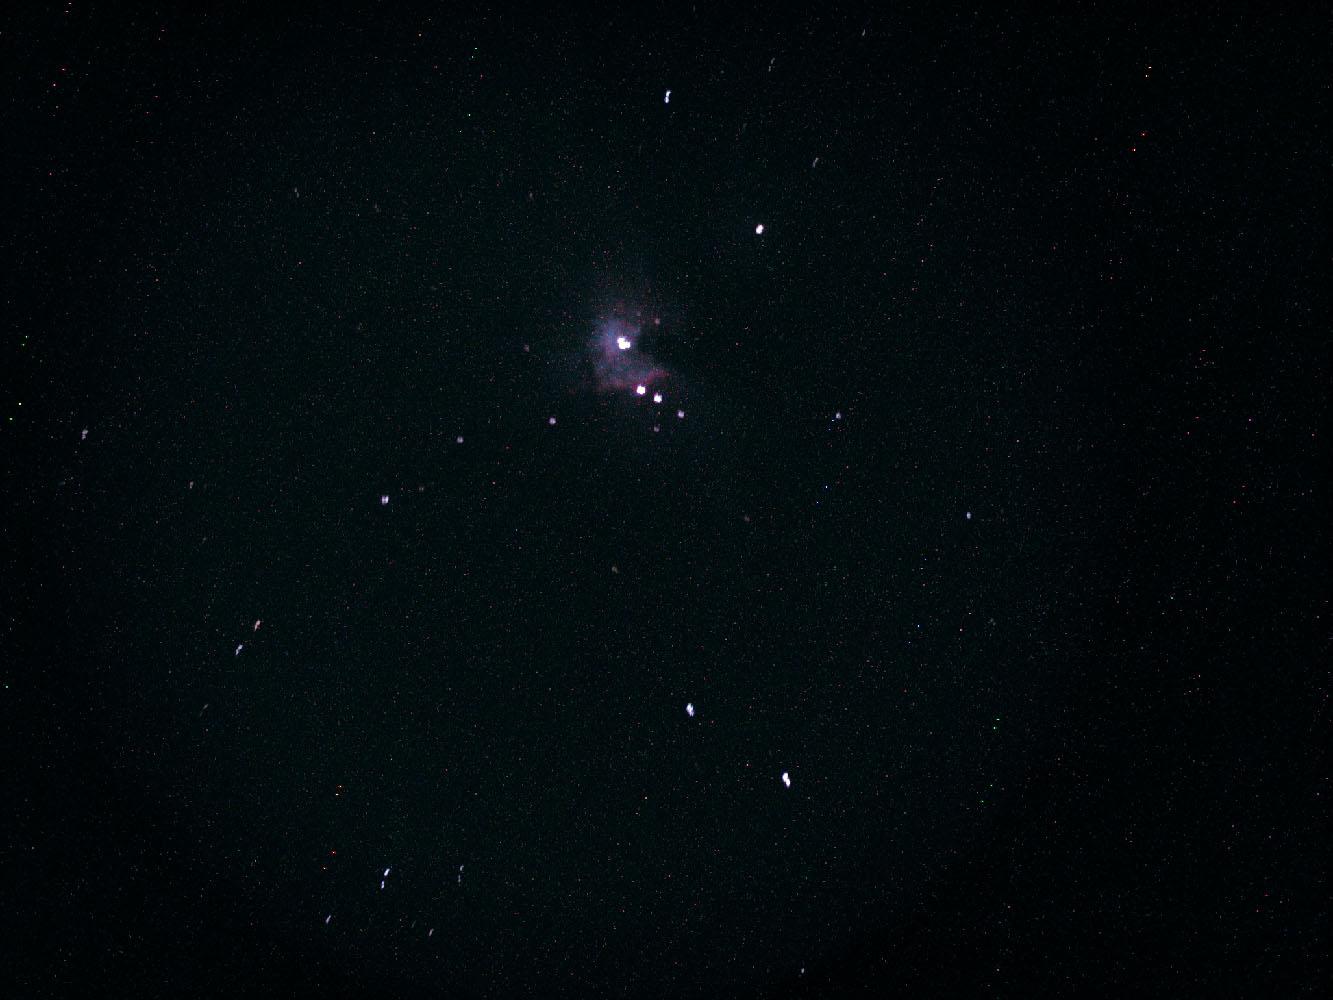 from small telescope orion nebula - photo #25